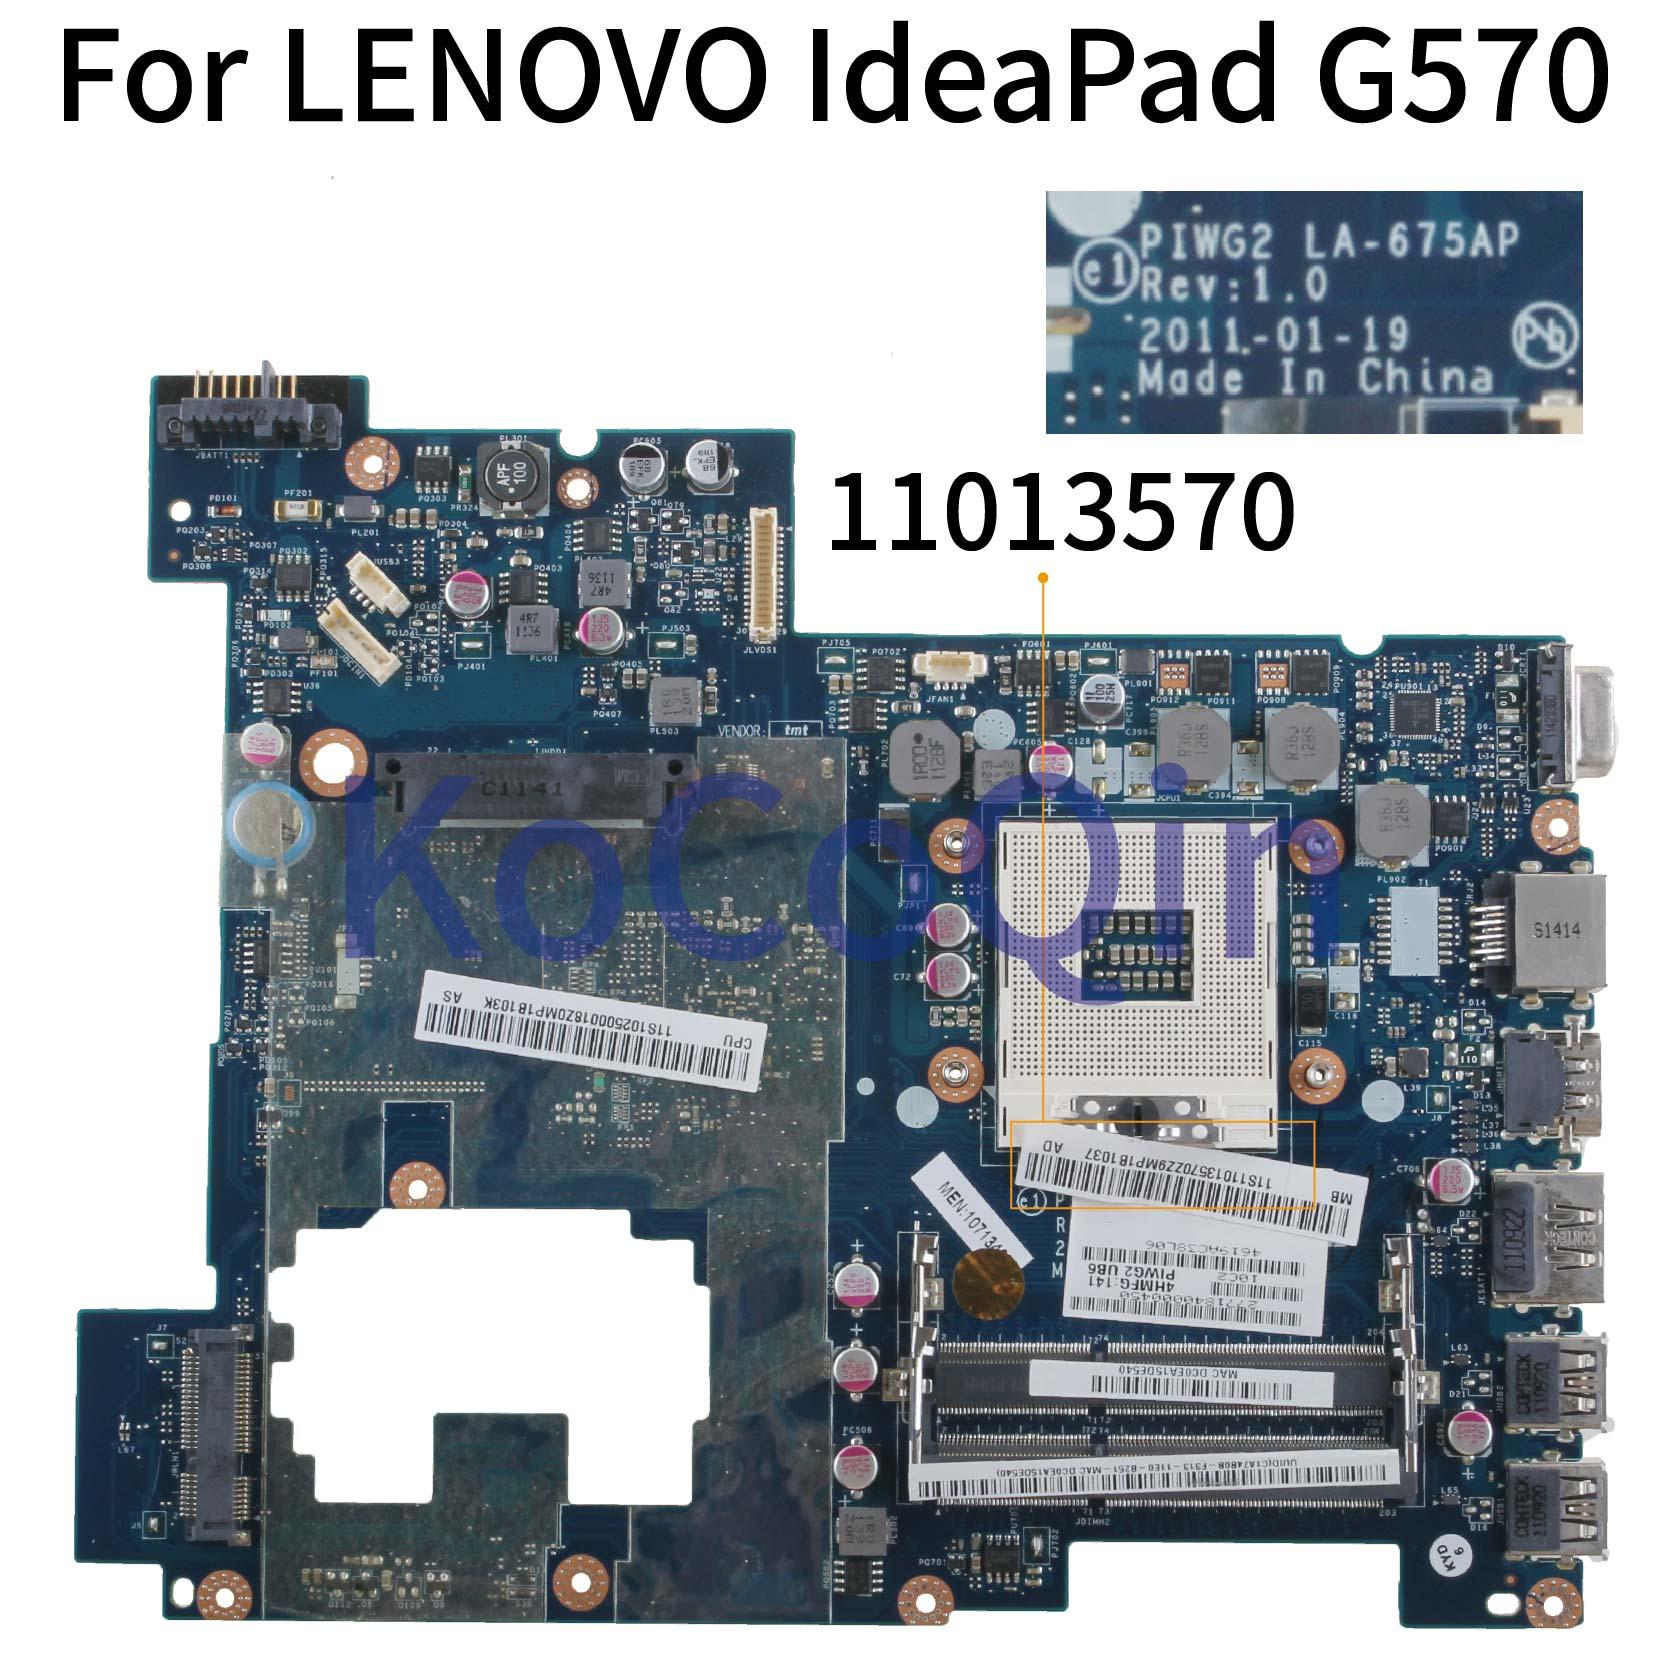 KoCoQin Laptop Motherboard For LENOVO IdeaPad G570 HM65 PGA989 HDMI Mainboard PIWG2 LA-675AP 11013570